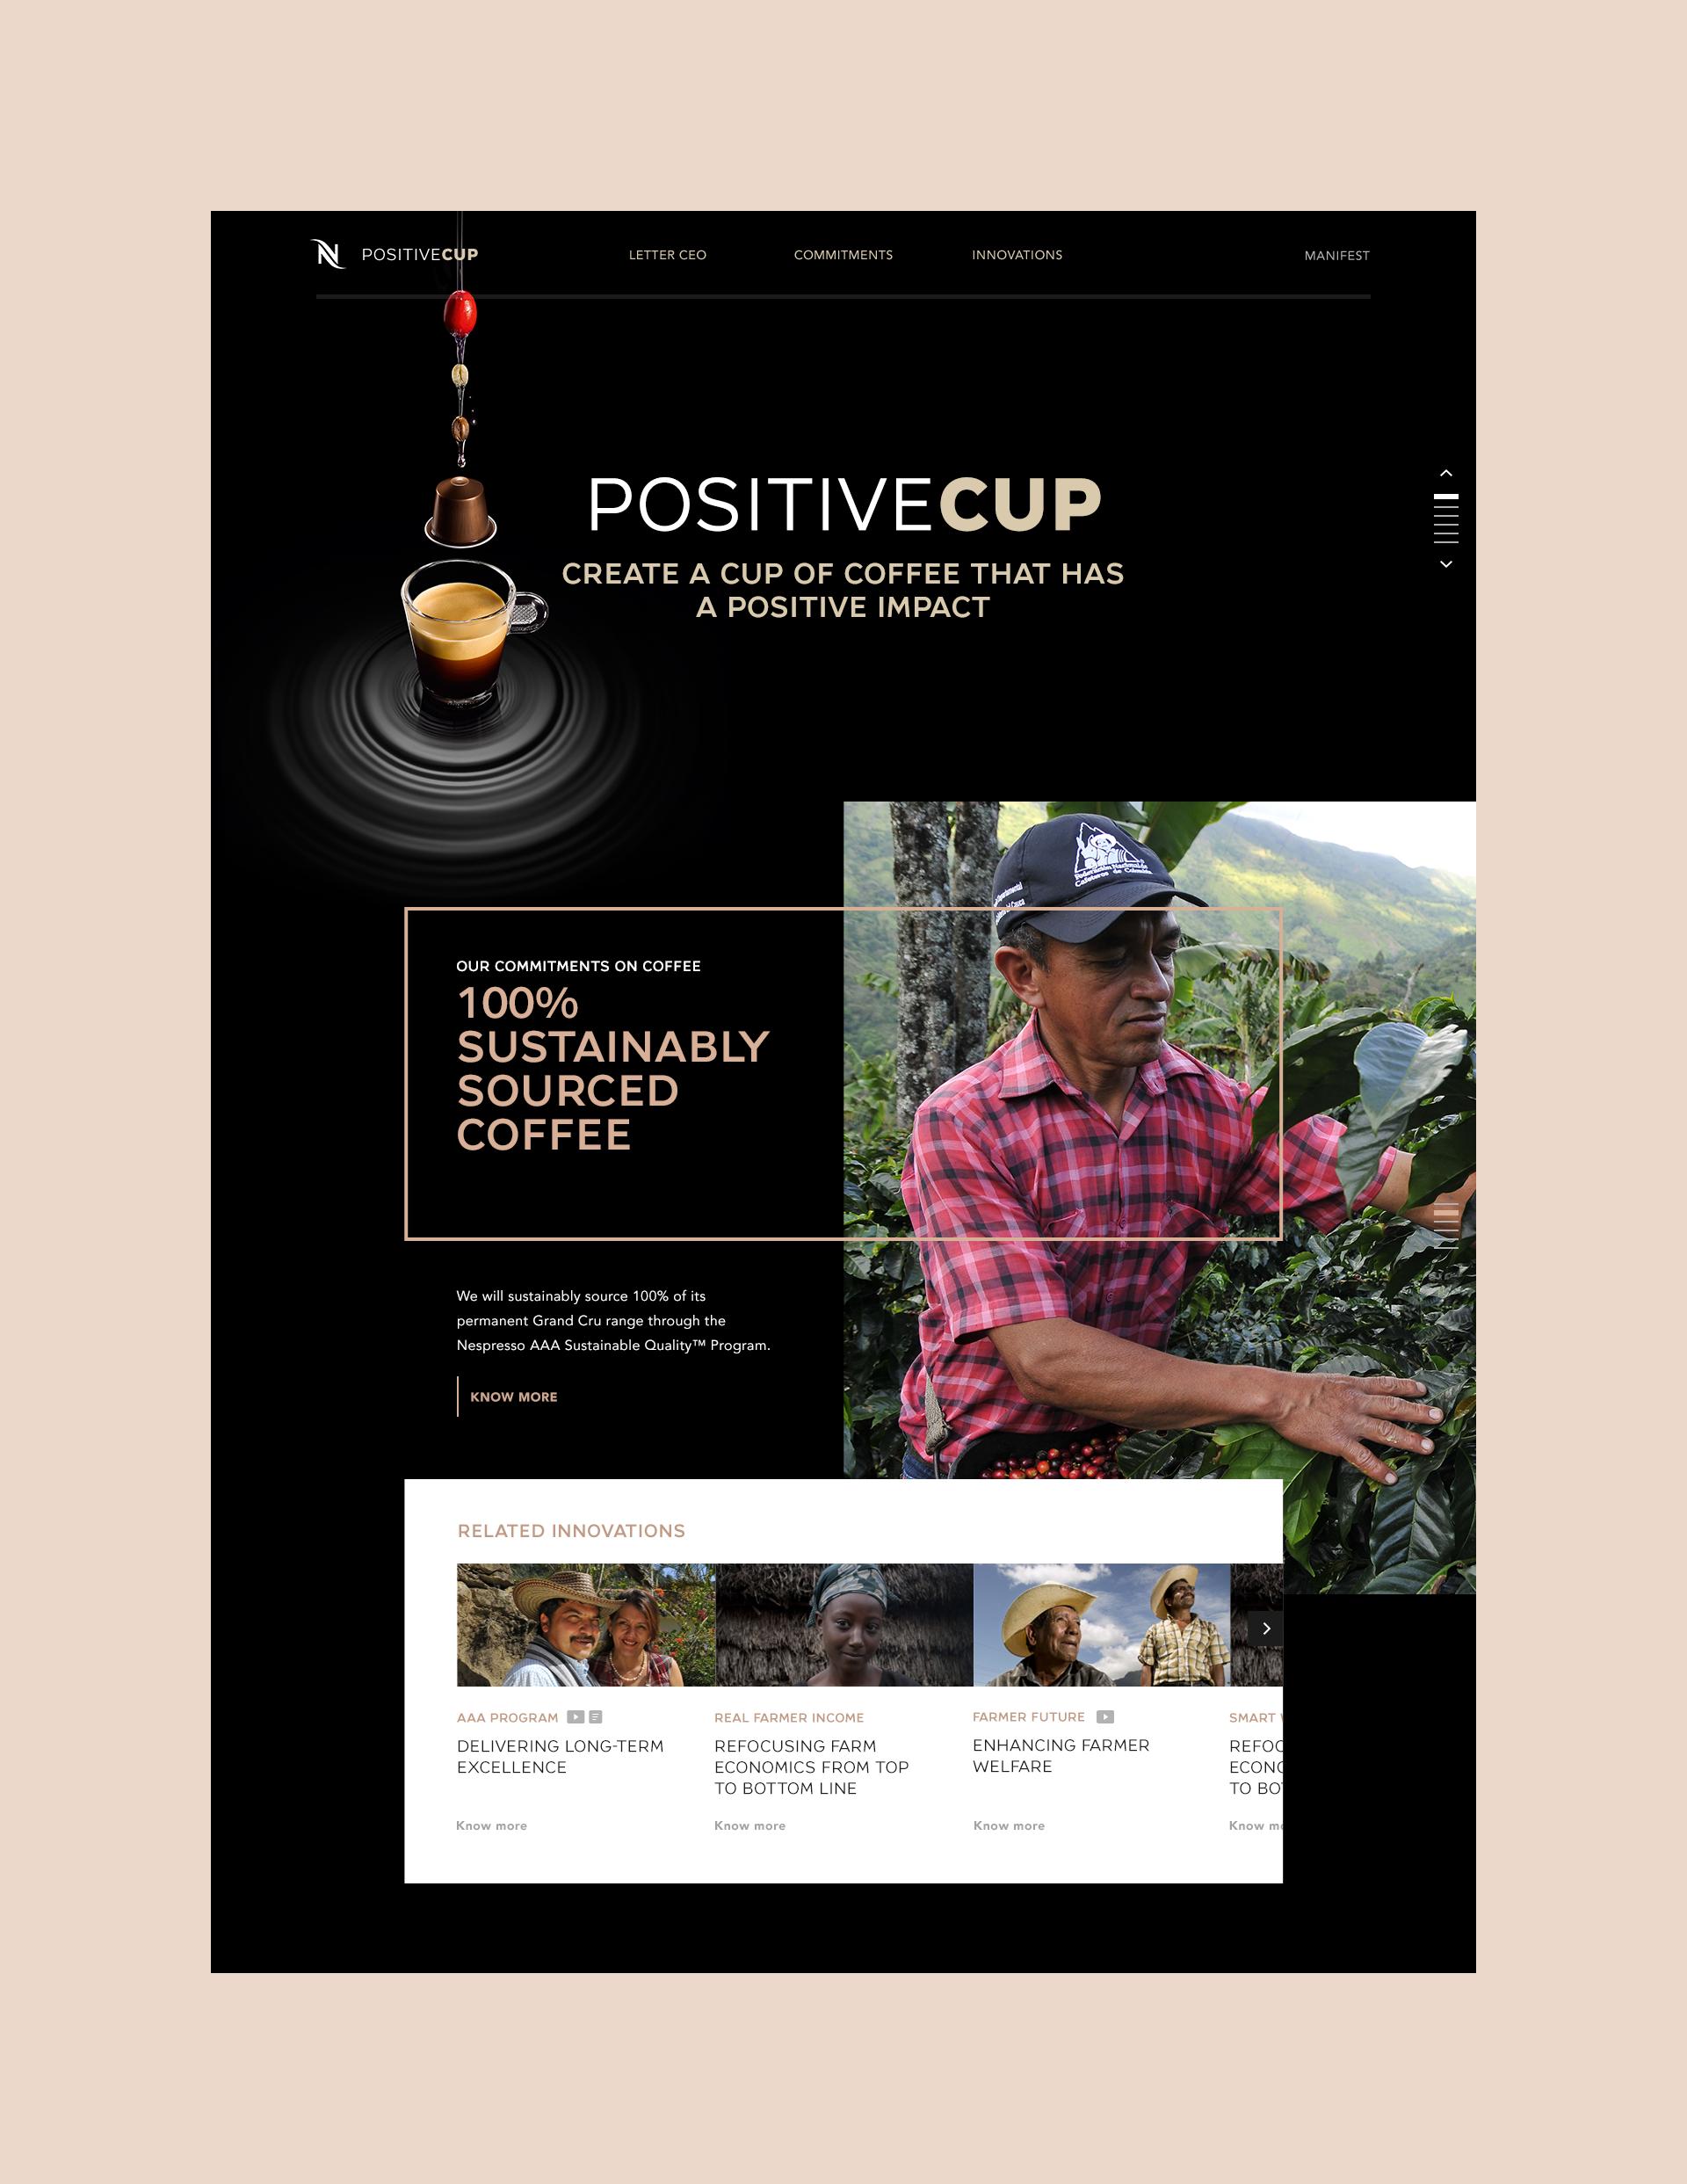 positivecup_H01_1920_01